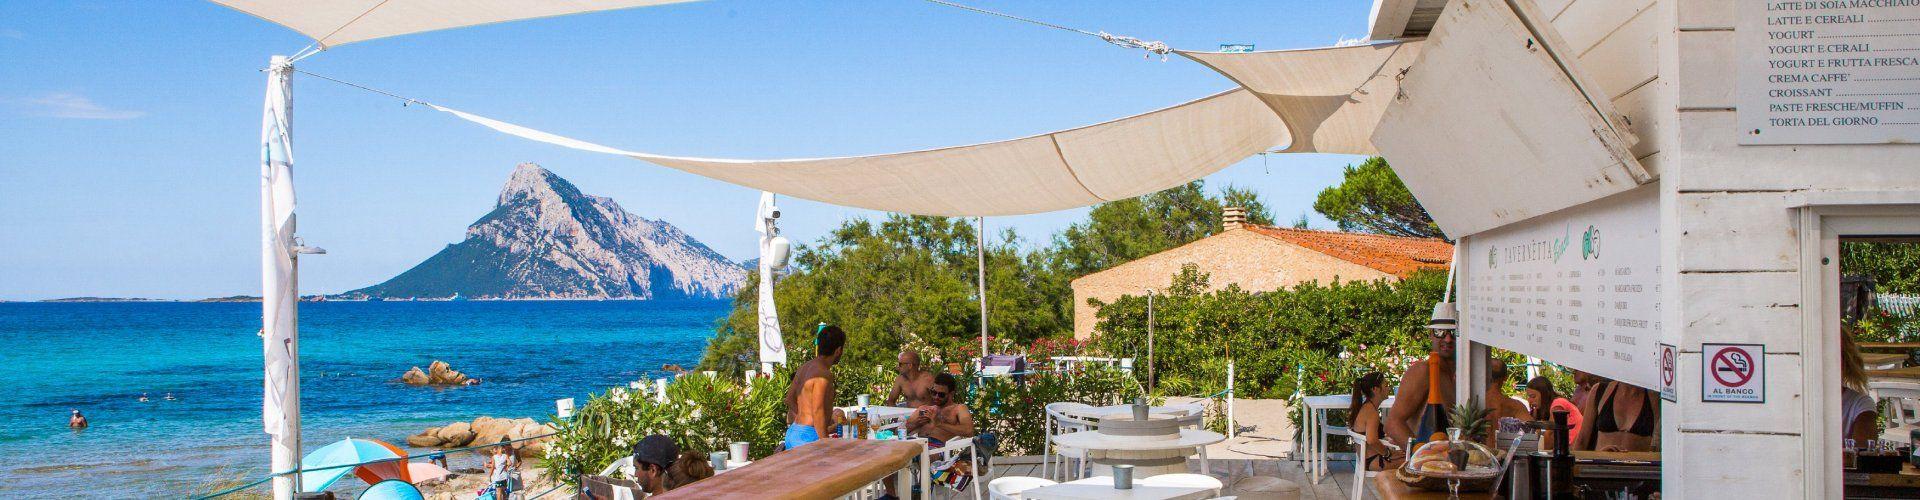 Restaurant direclty on the beach of Porto Taverna